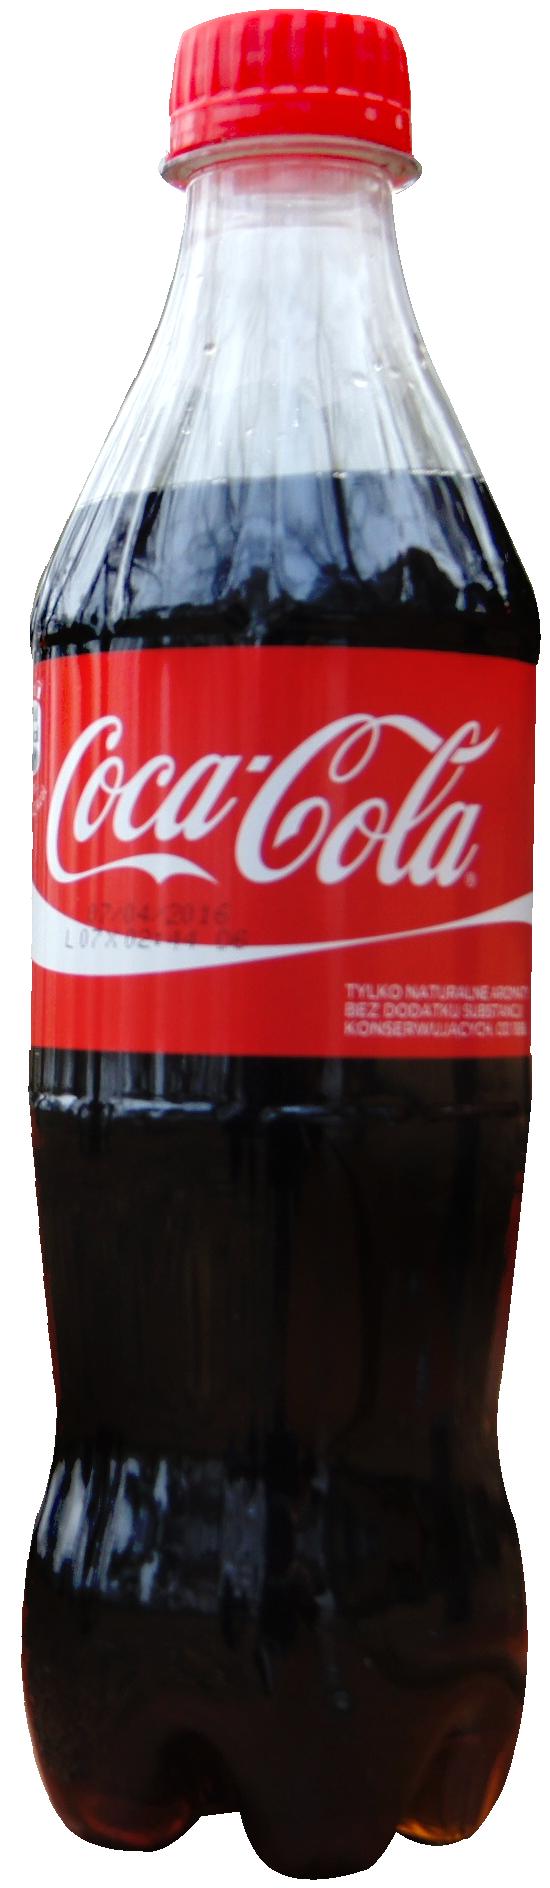 Cola HD PNG